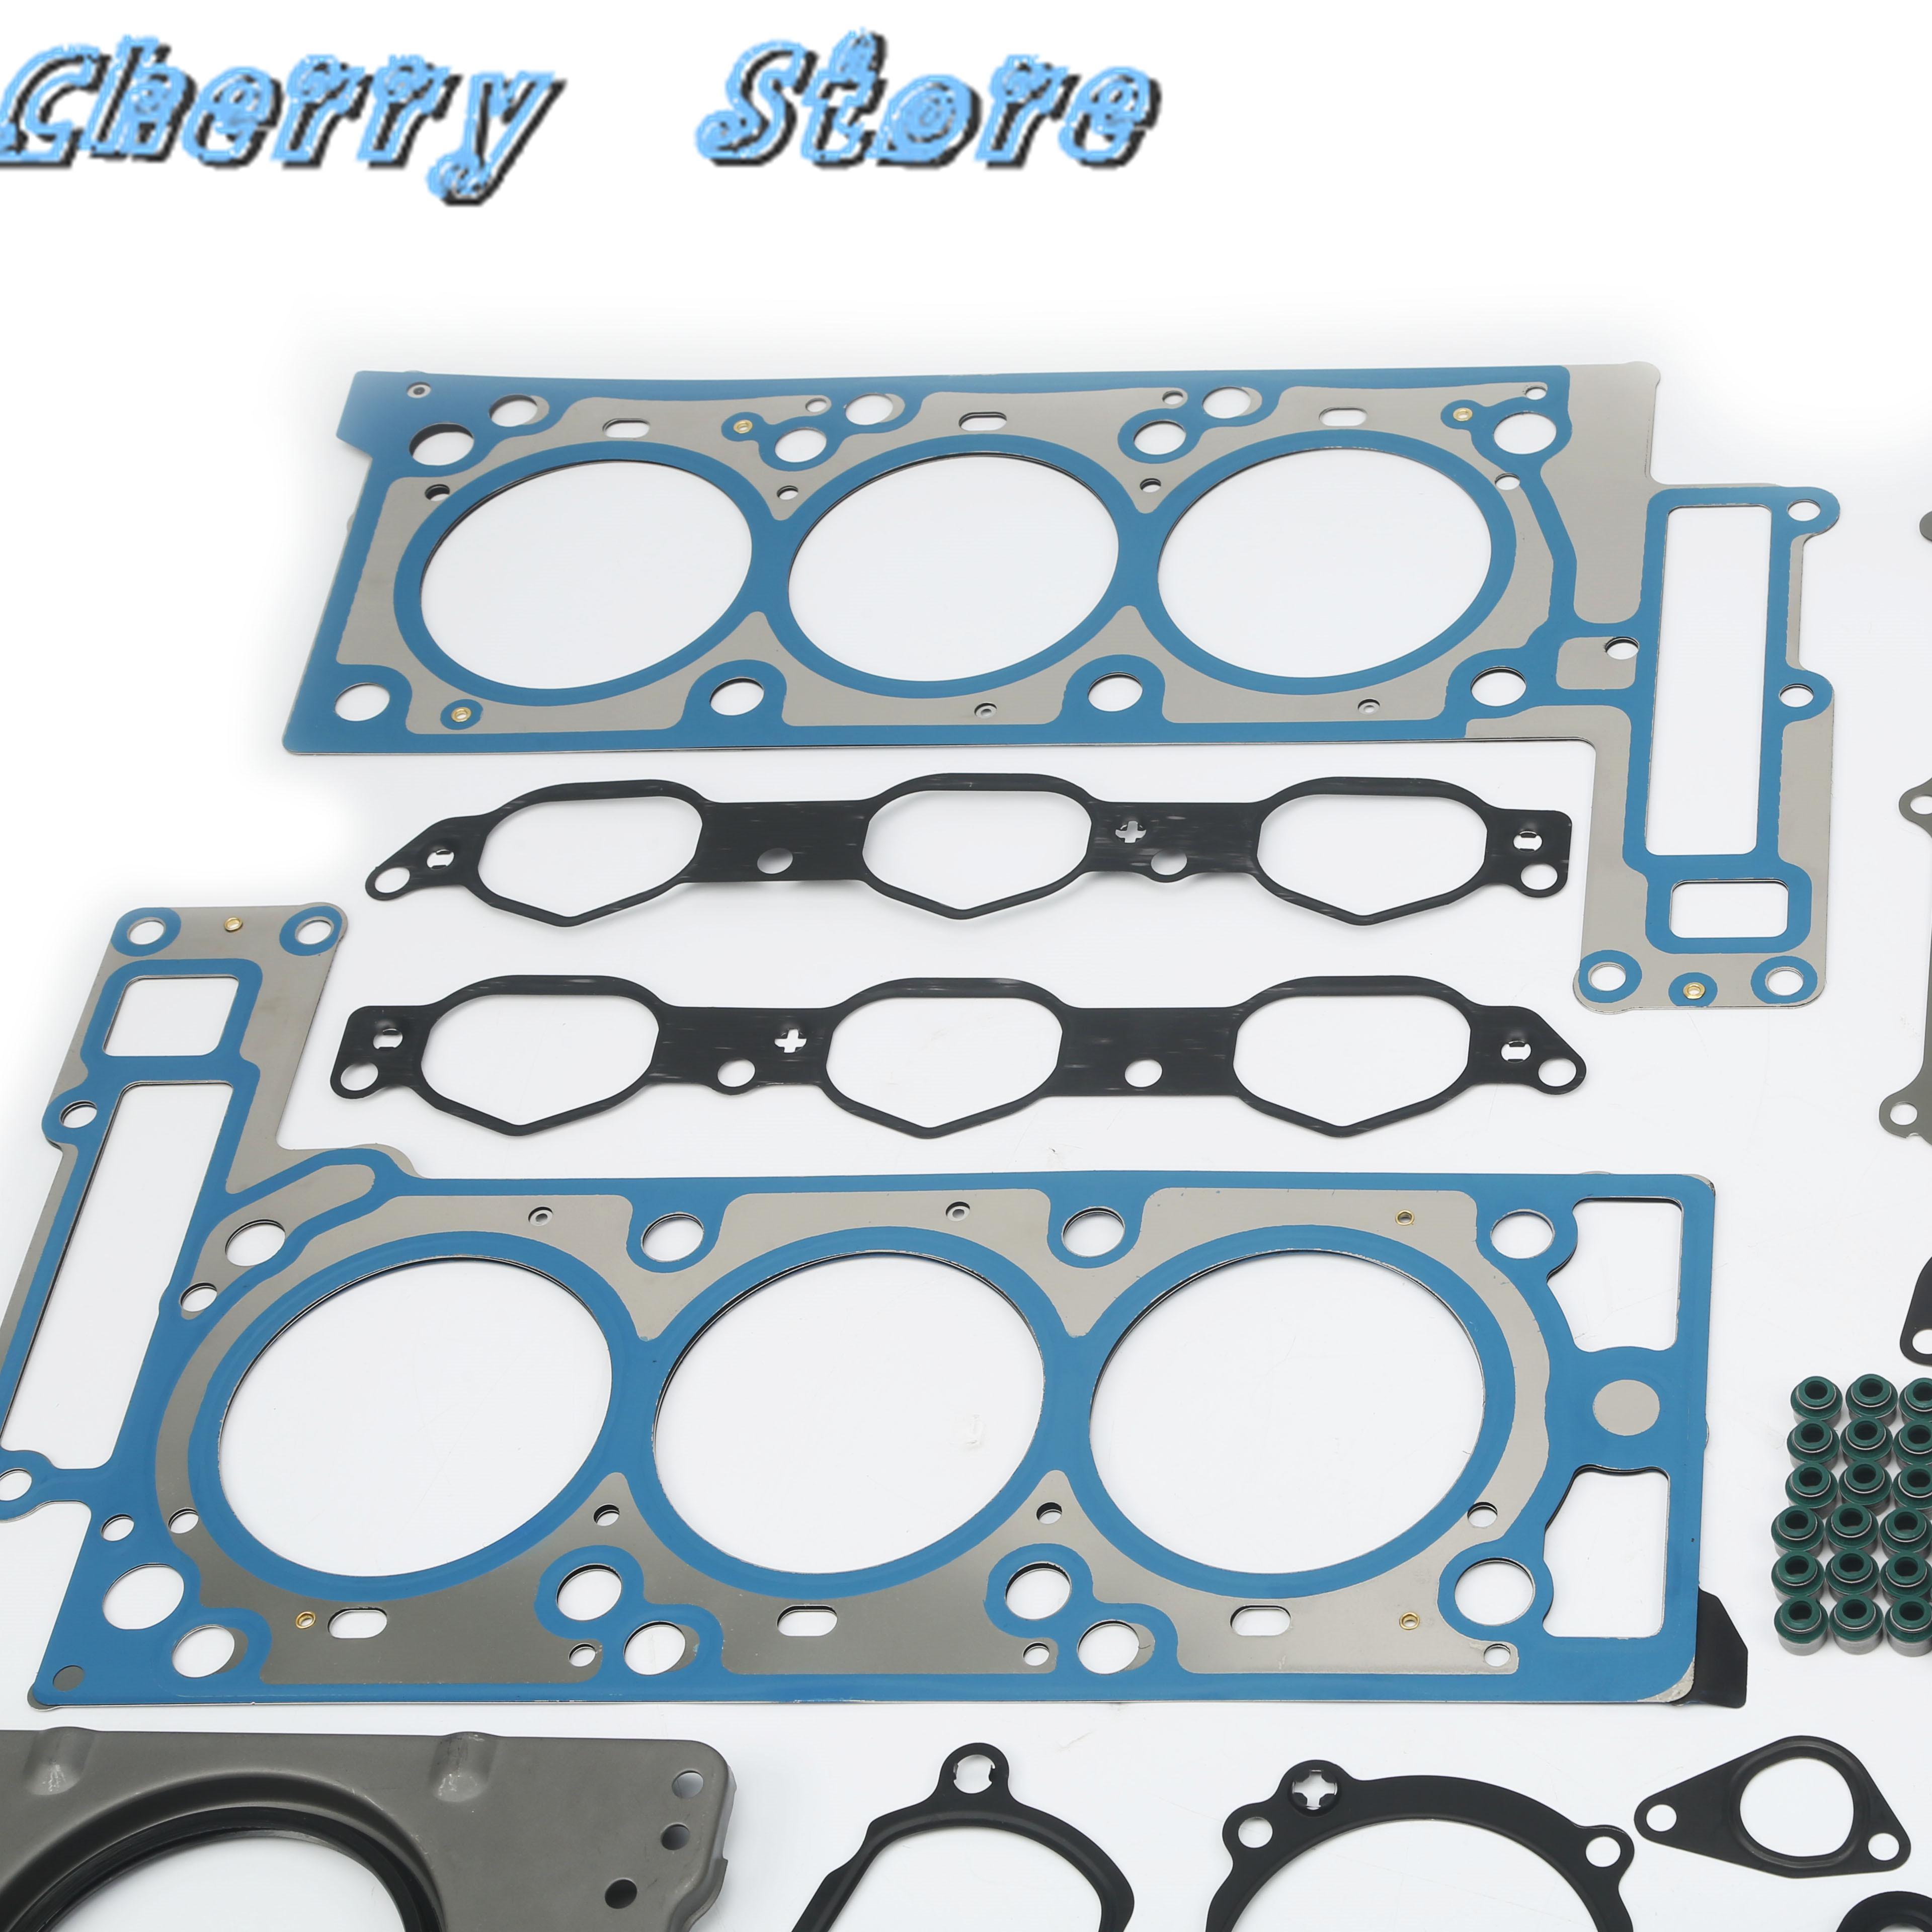 Купить с кэшбэком 272 016 15 20 Multilayer Steel Engine Cylinder Head Gasket Seals For Mercedes-Benz A209 C209 C219 W211 A207 C207 X204 W164 V251